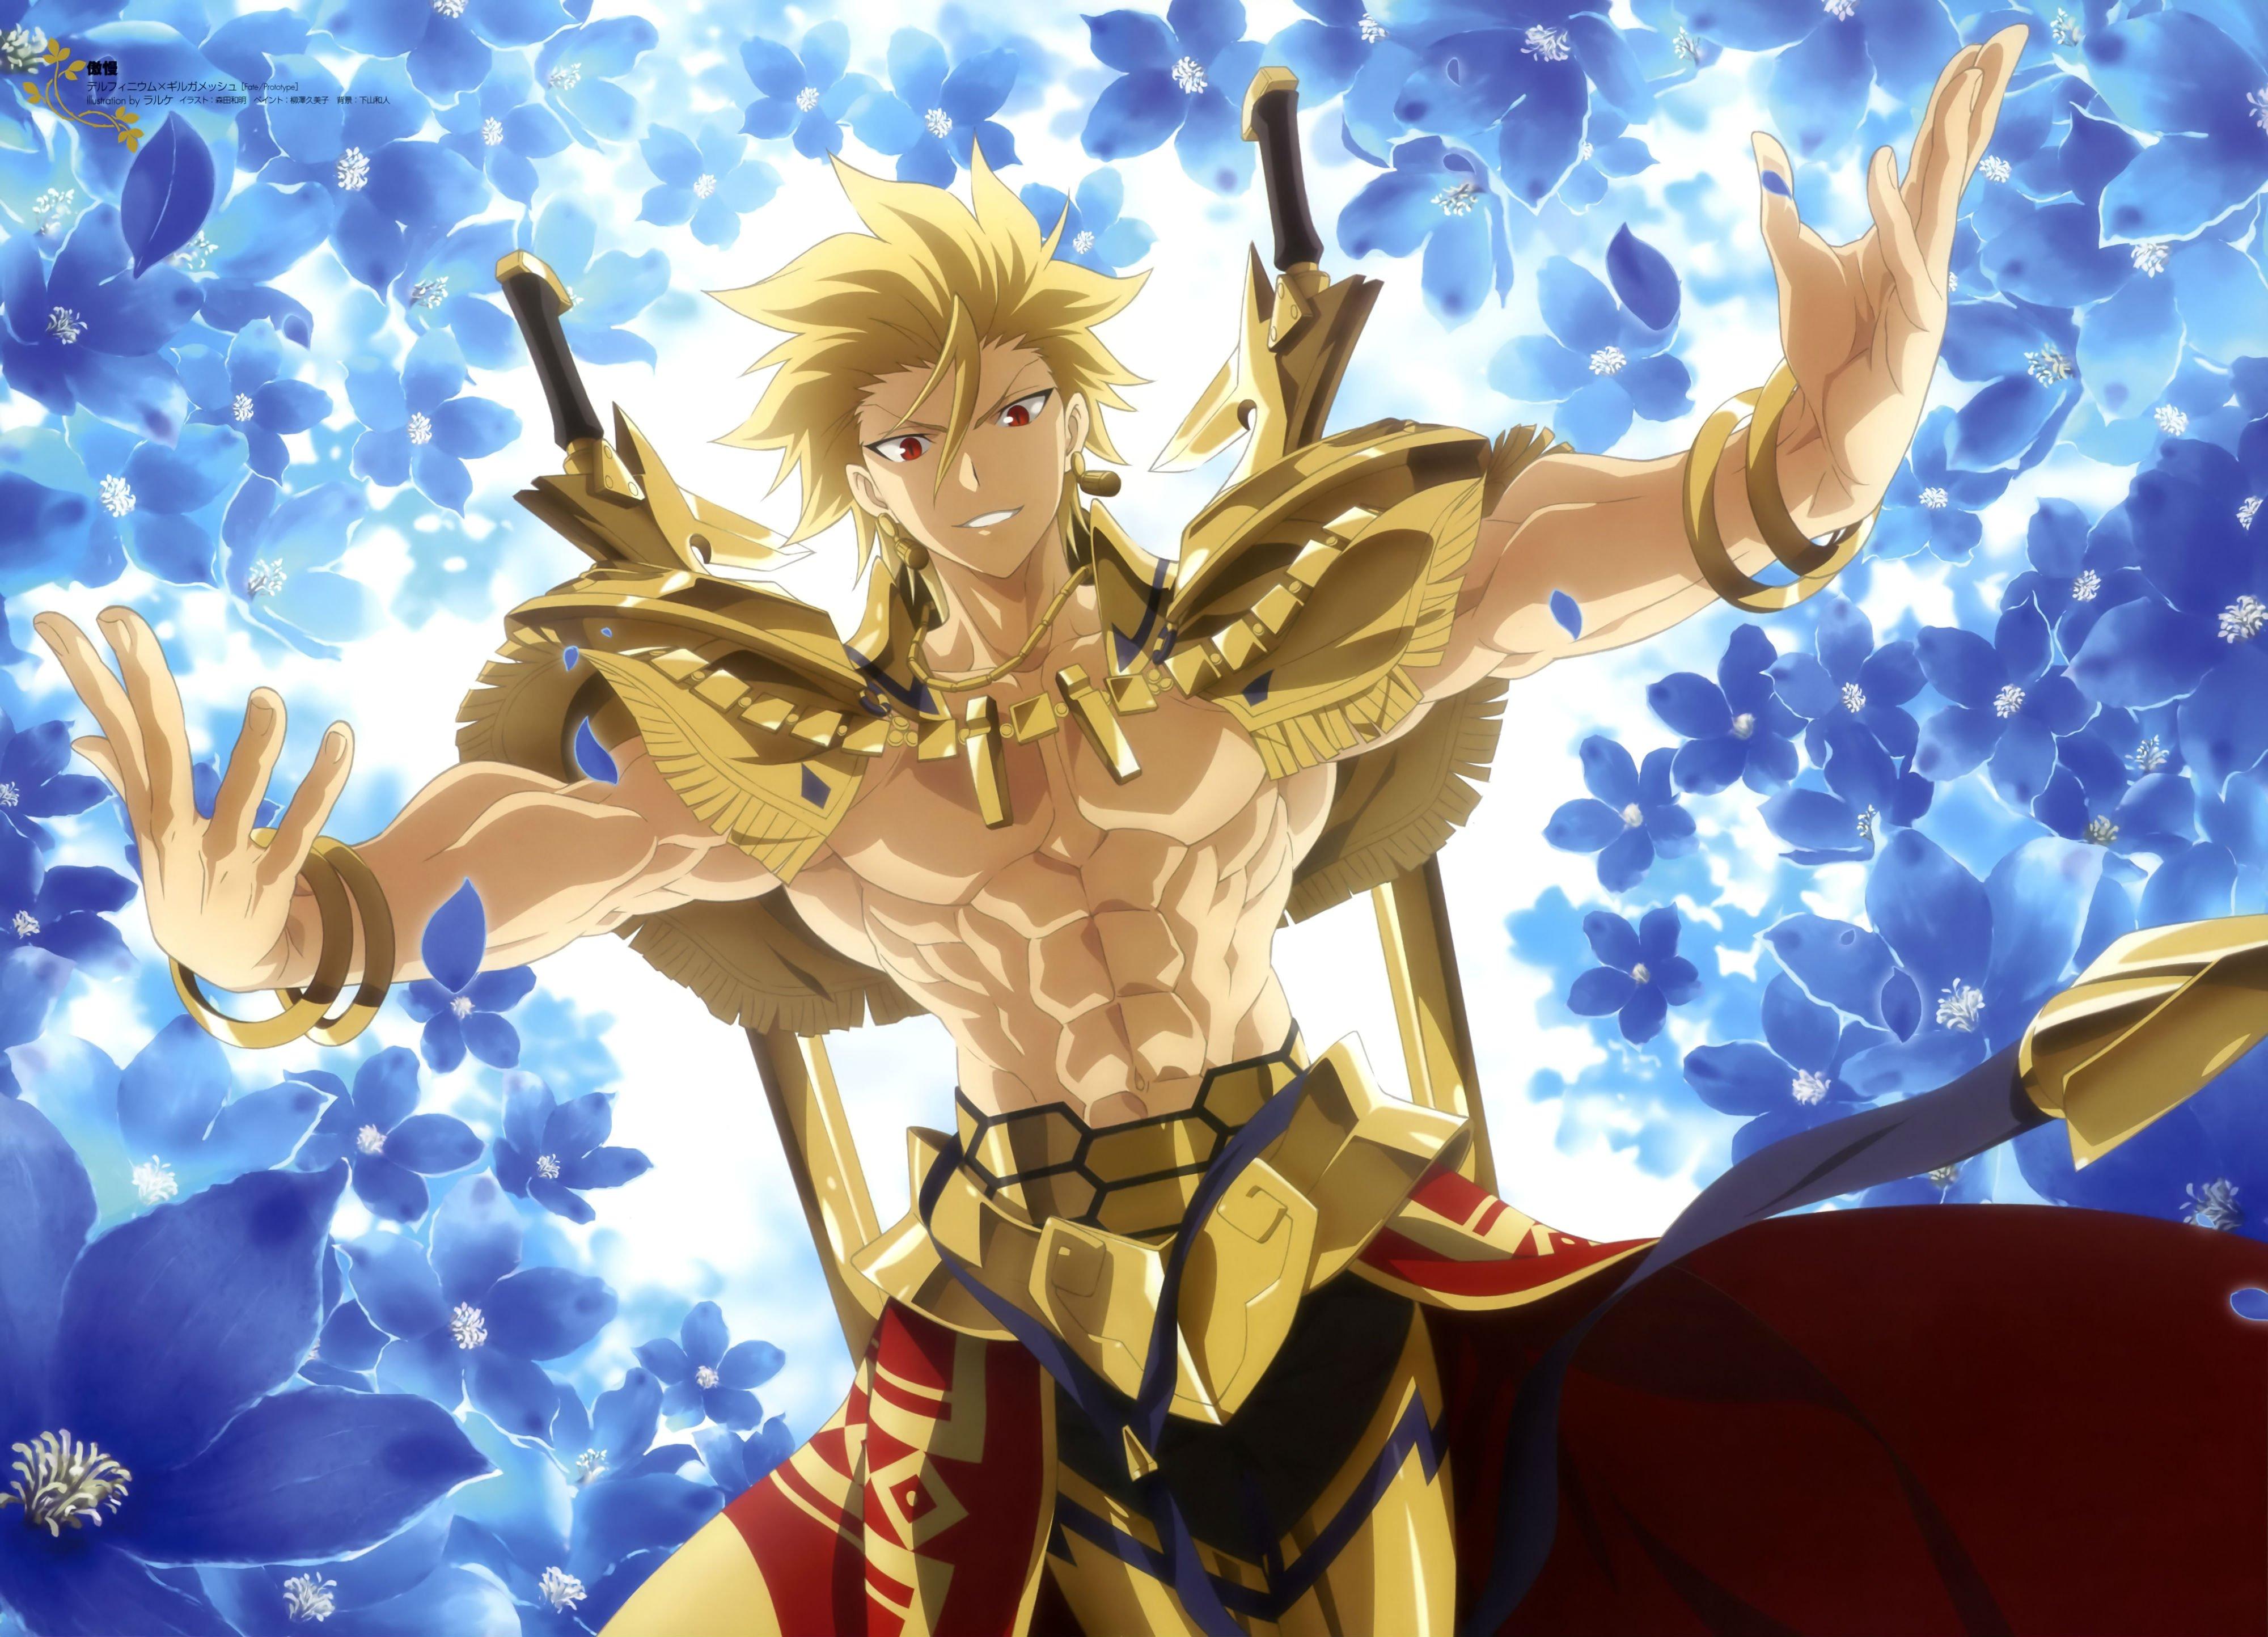 Fate stay night Gilgamesh g wallpaper 4000x2887 340768 4000x2887